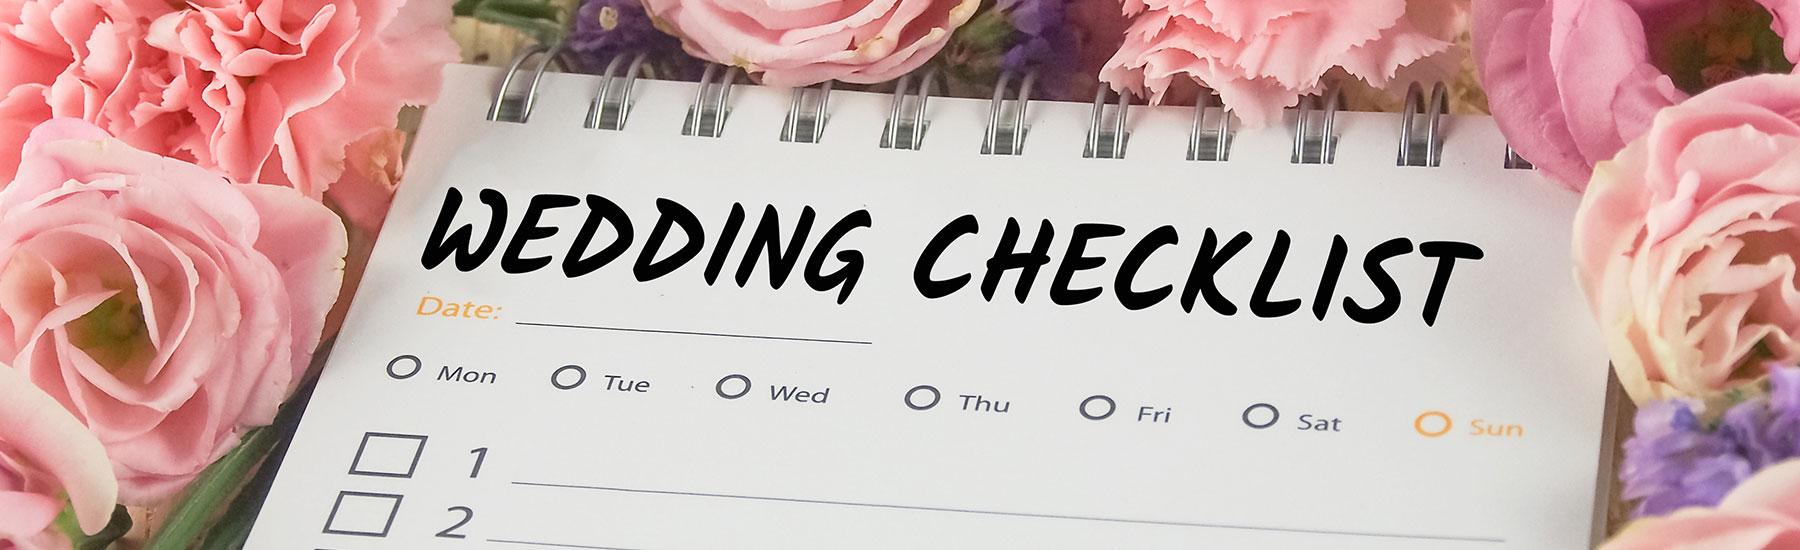 Ultimate Wedding Planning Checklist for Indian Wedding